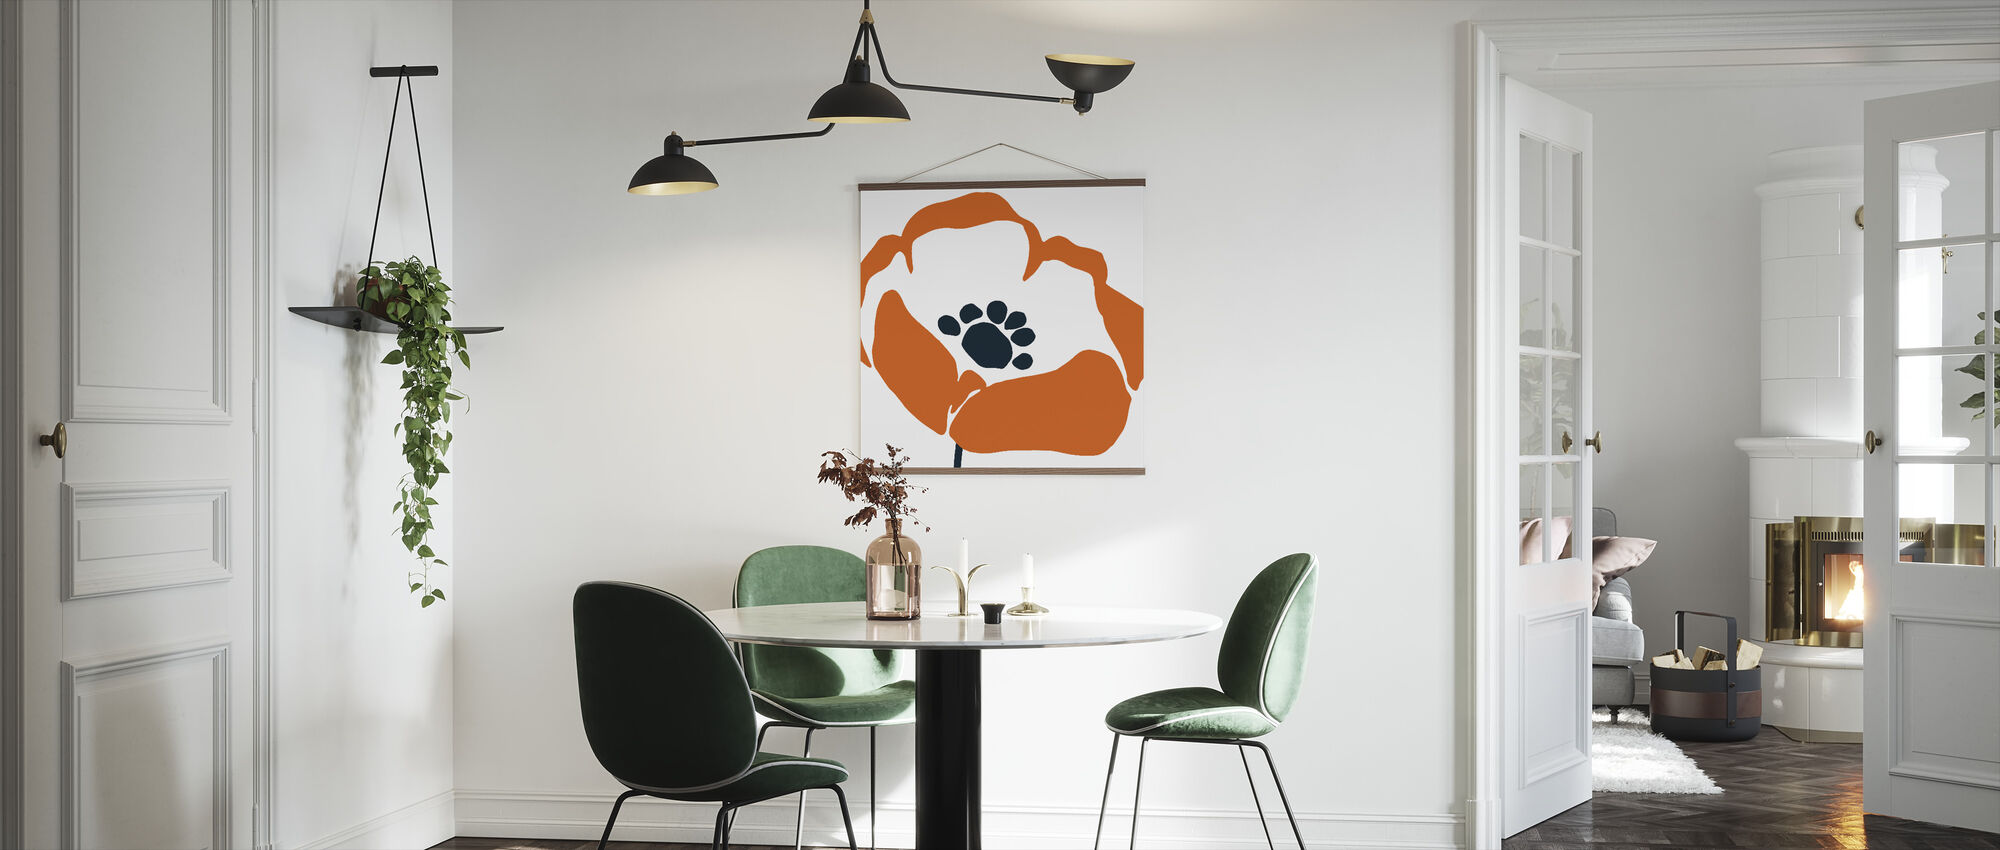 Pop Art Floral III - Poster - Kitchen